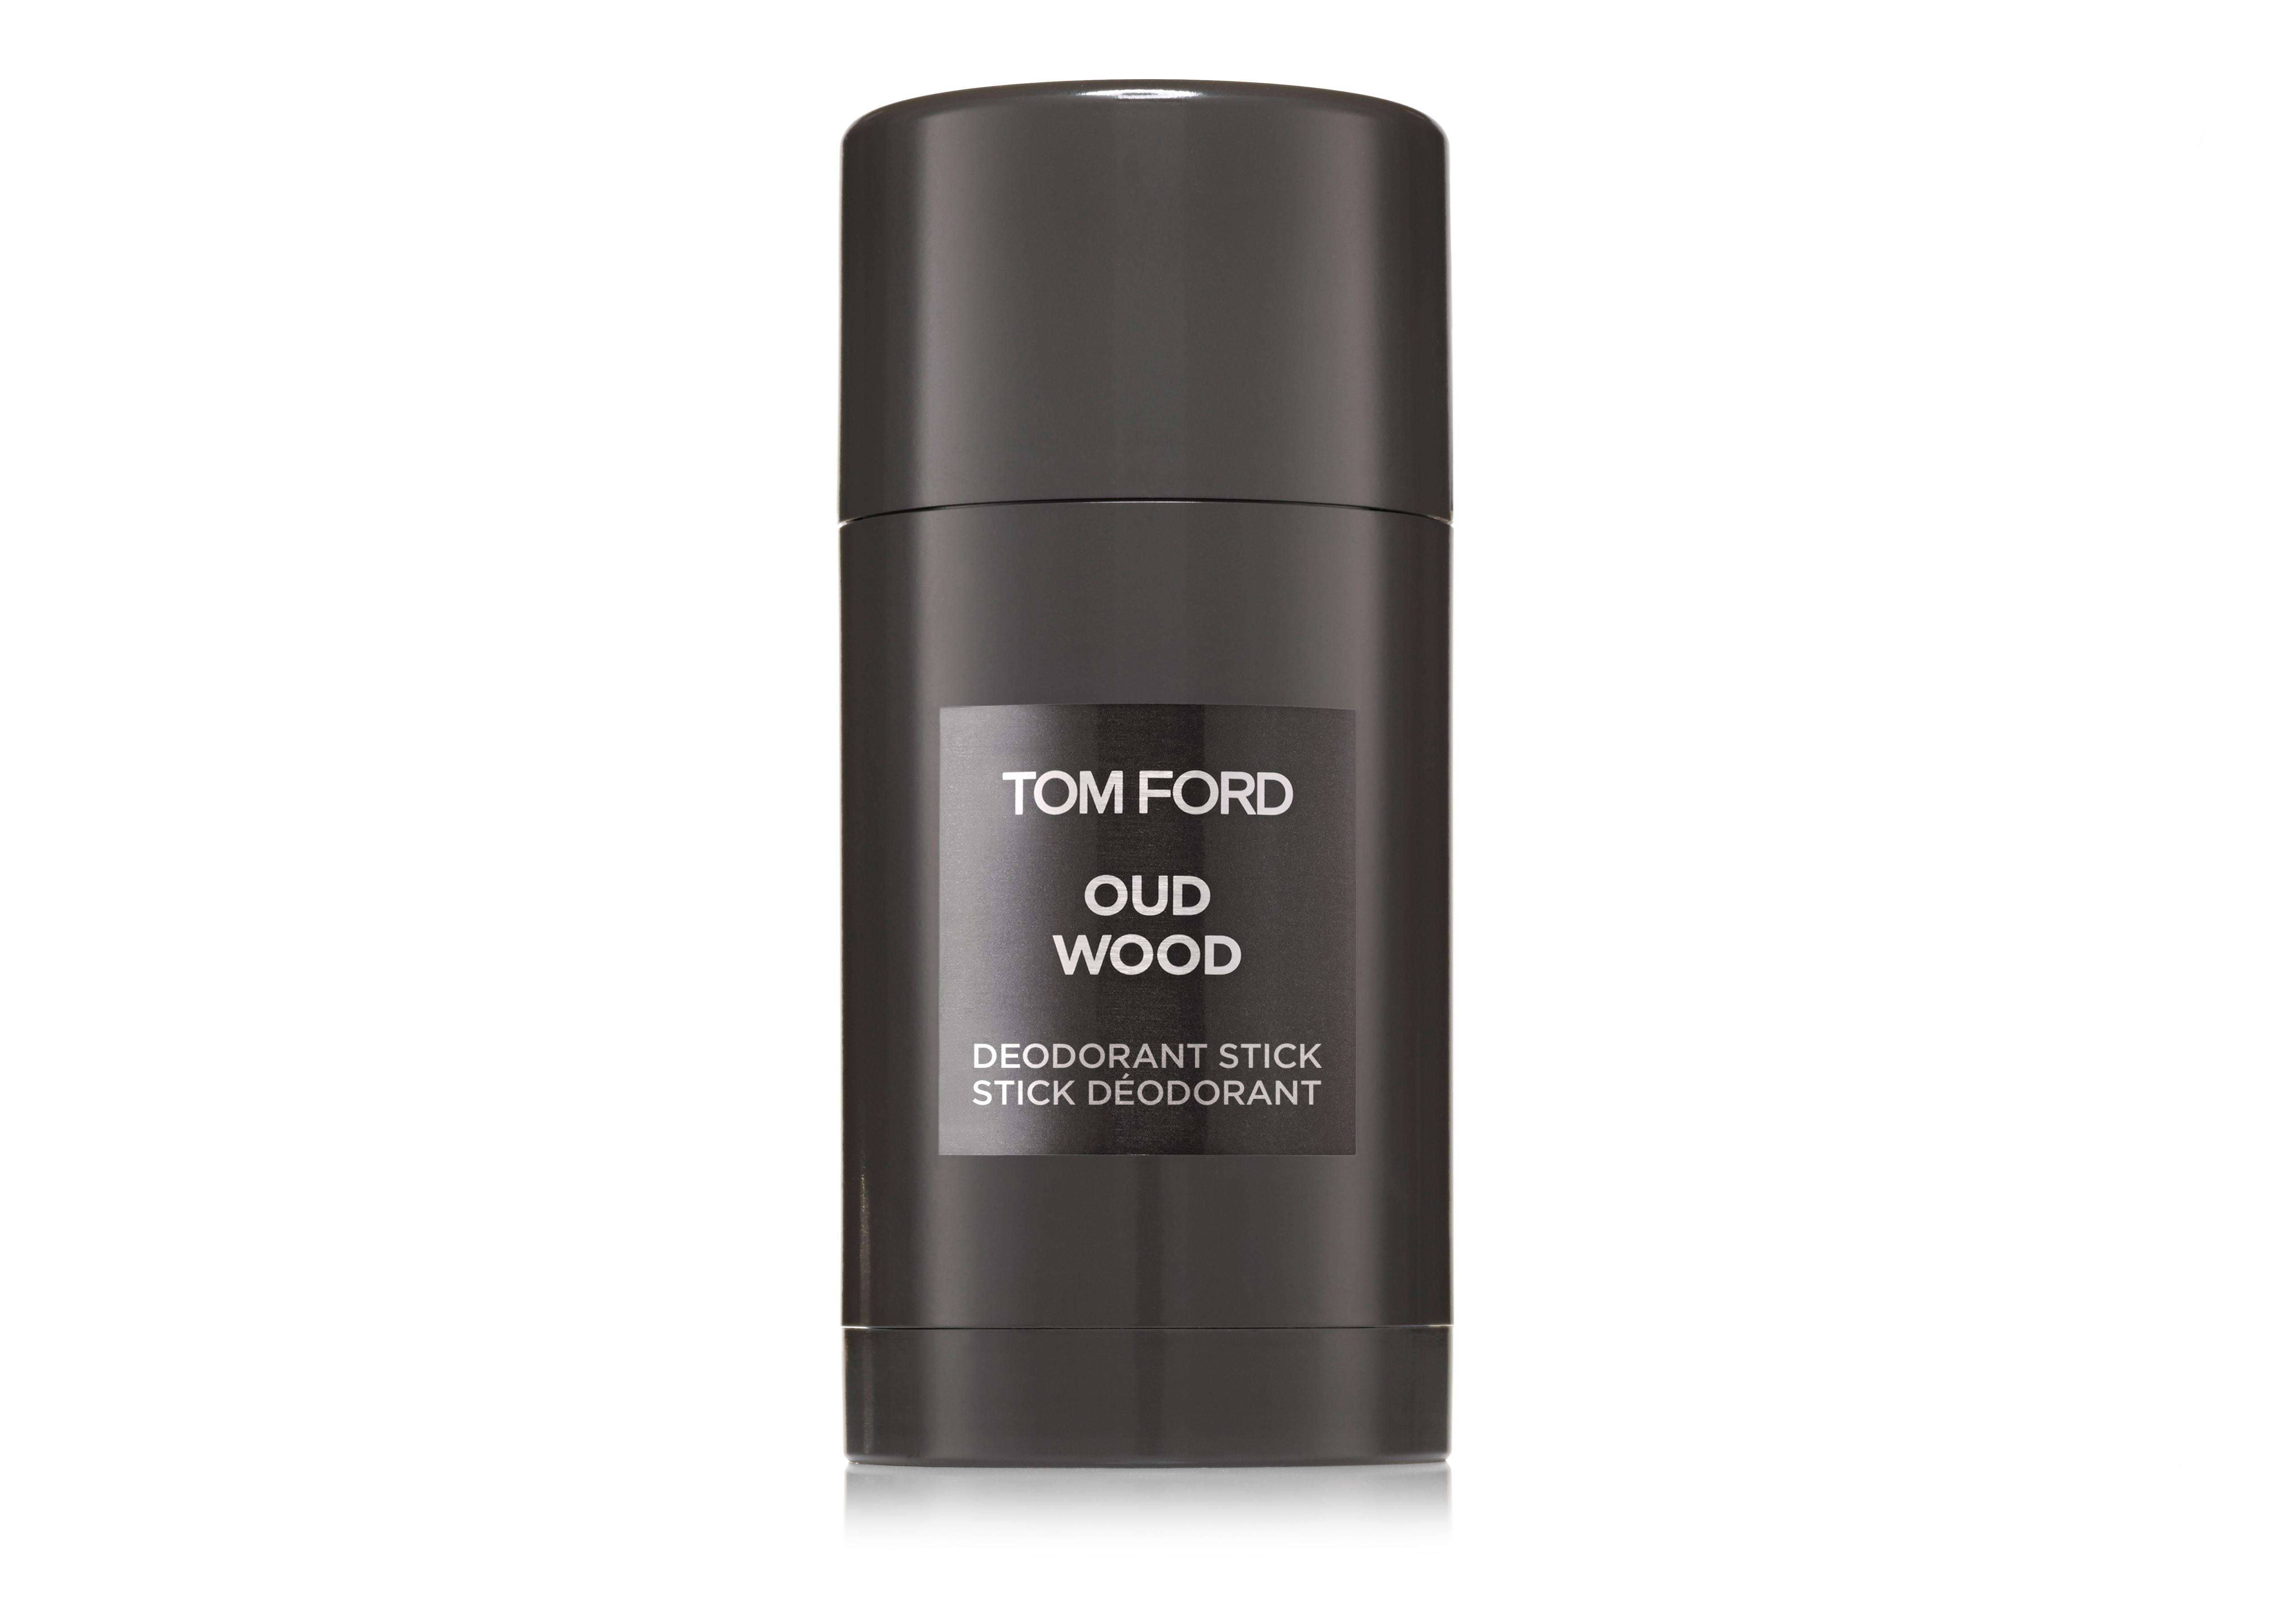 Oud Wood Deodorant Stick A thumbnail